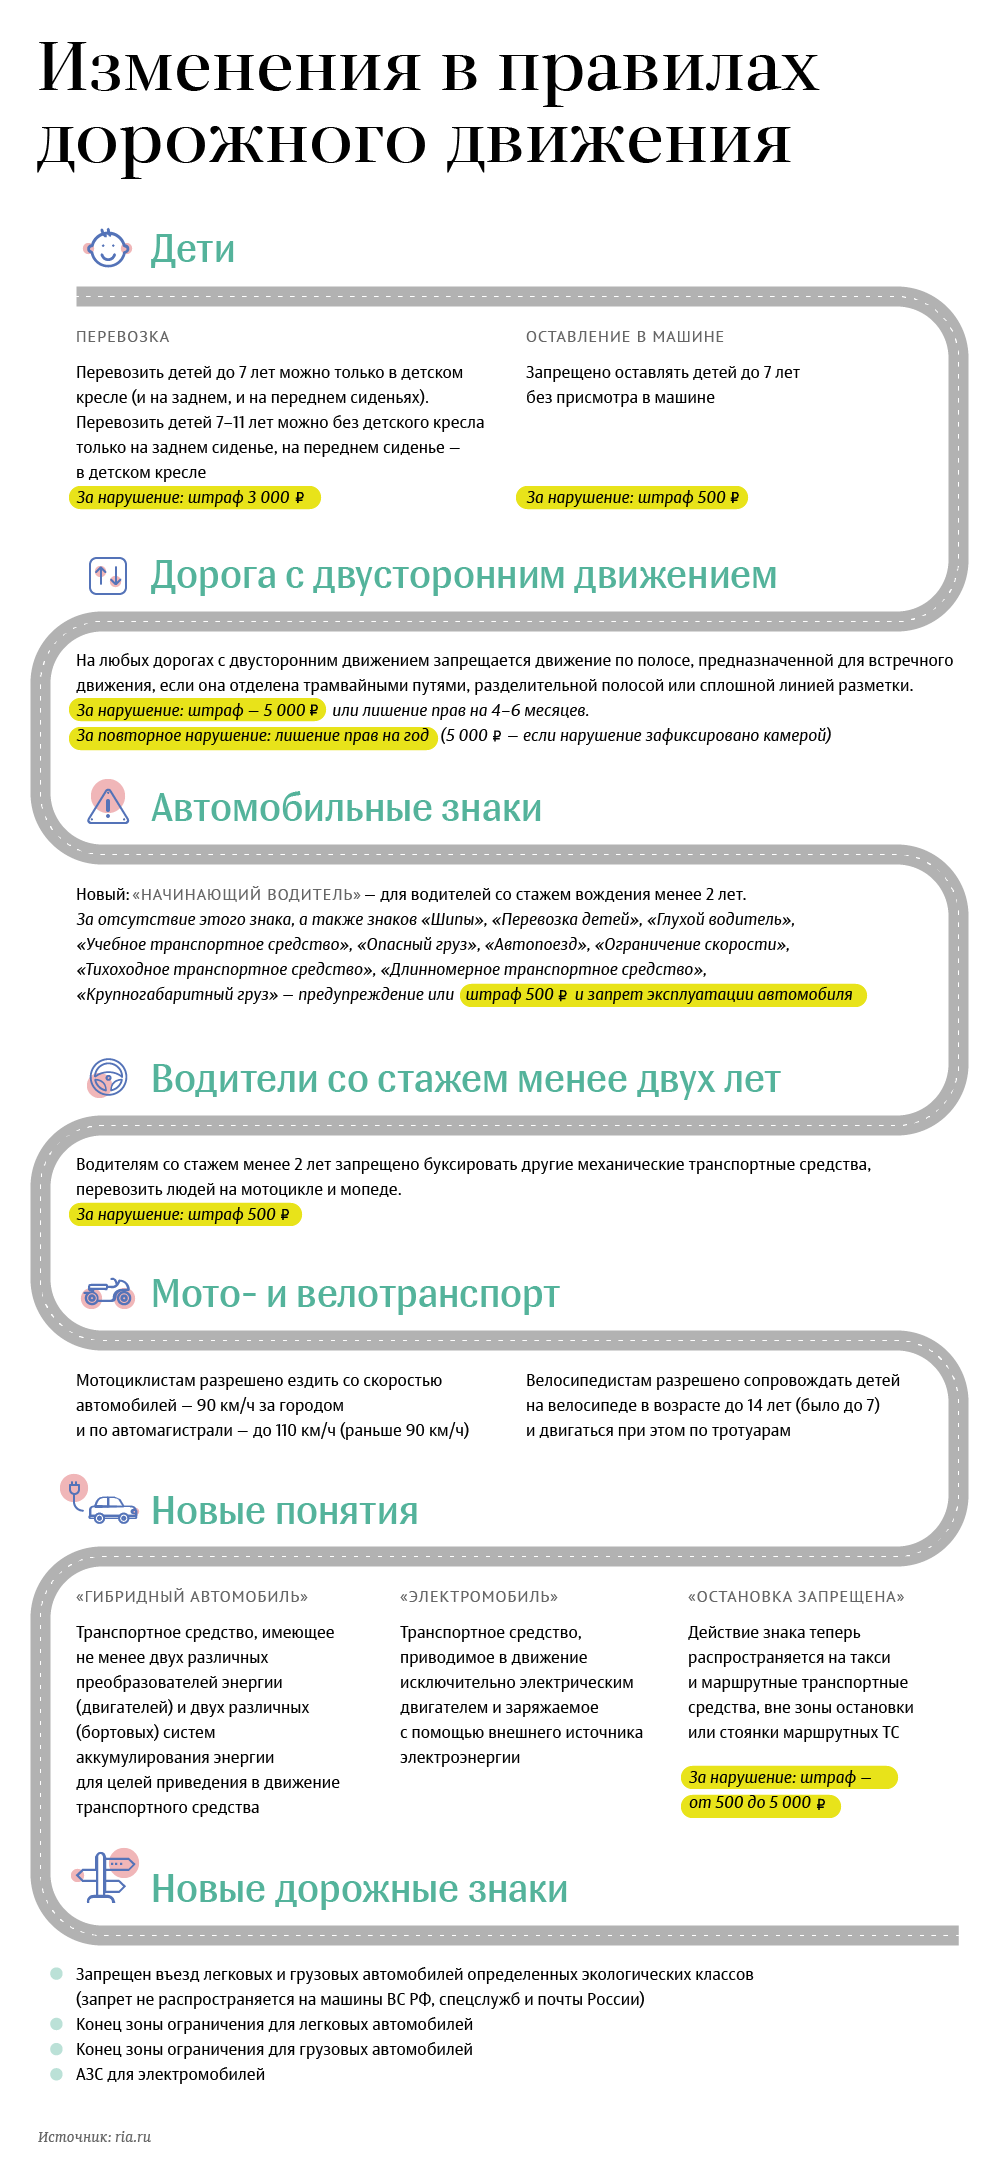 https://cdn3.img.ria.ru/images/149864/48/1498644848.png